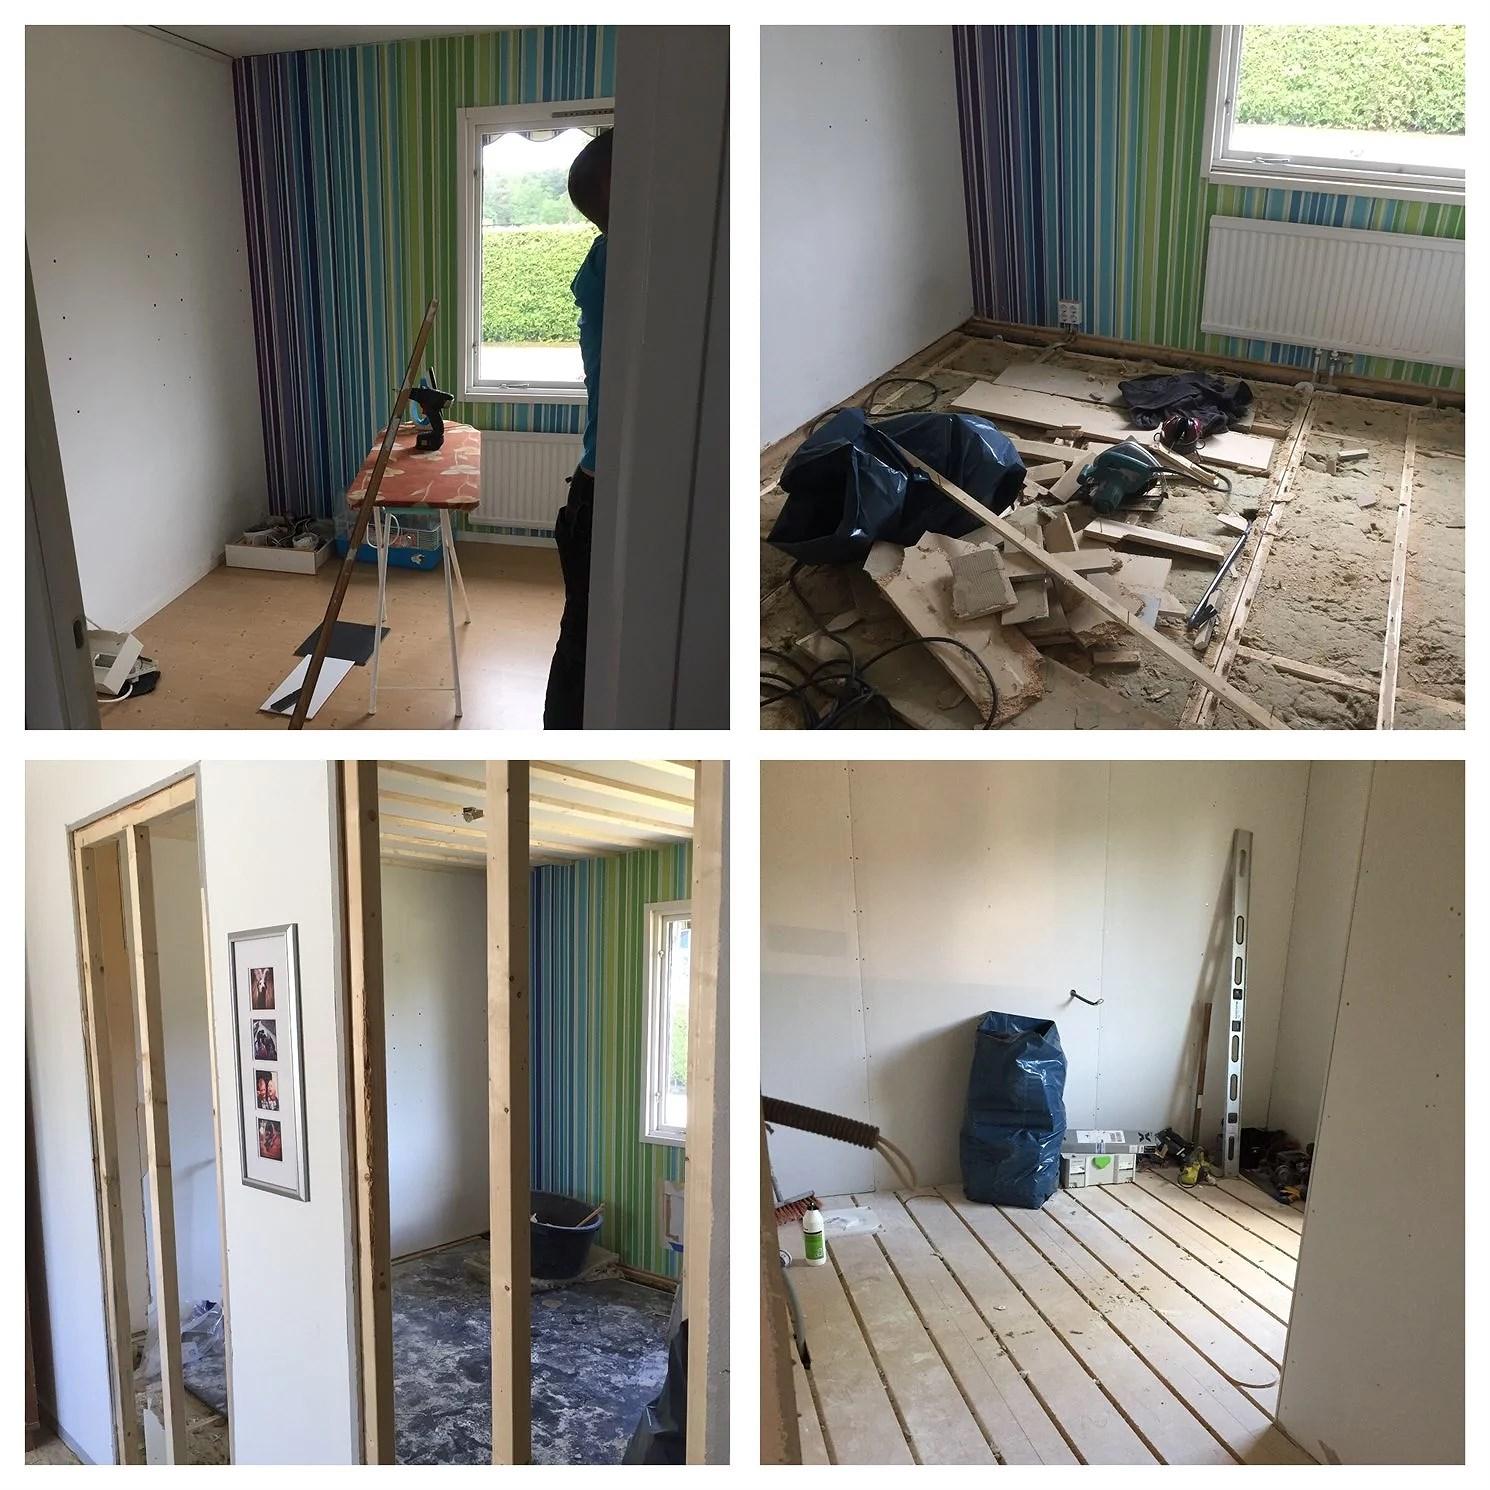 tereseengqvist: VÃ¥rt nya badrum